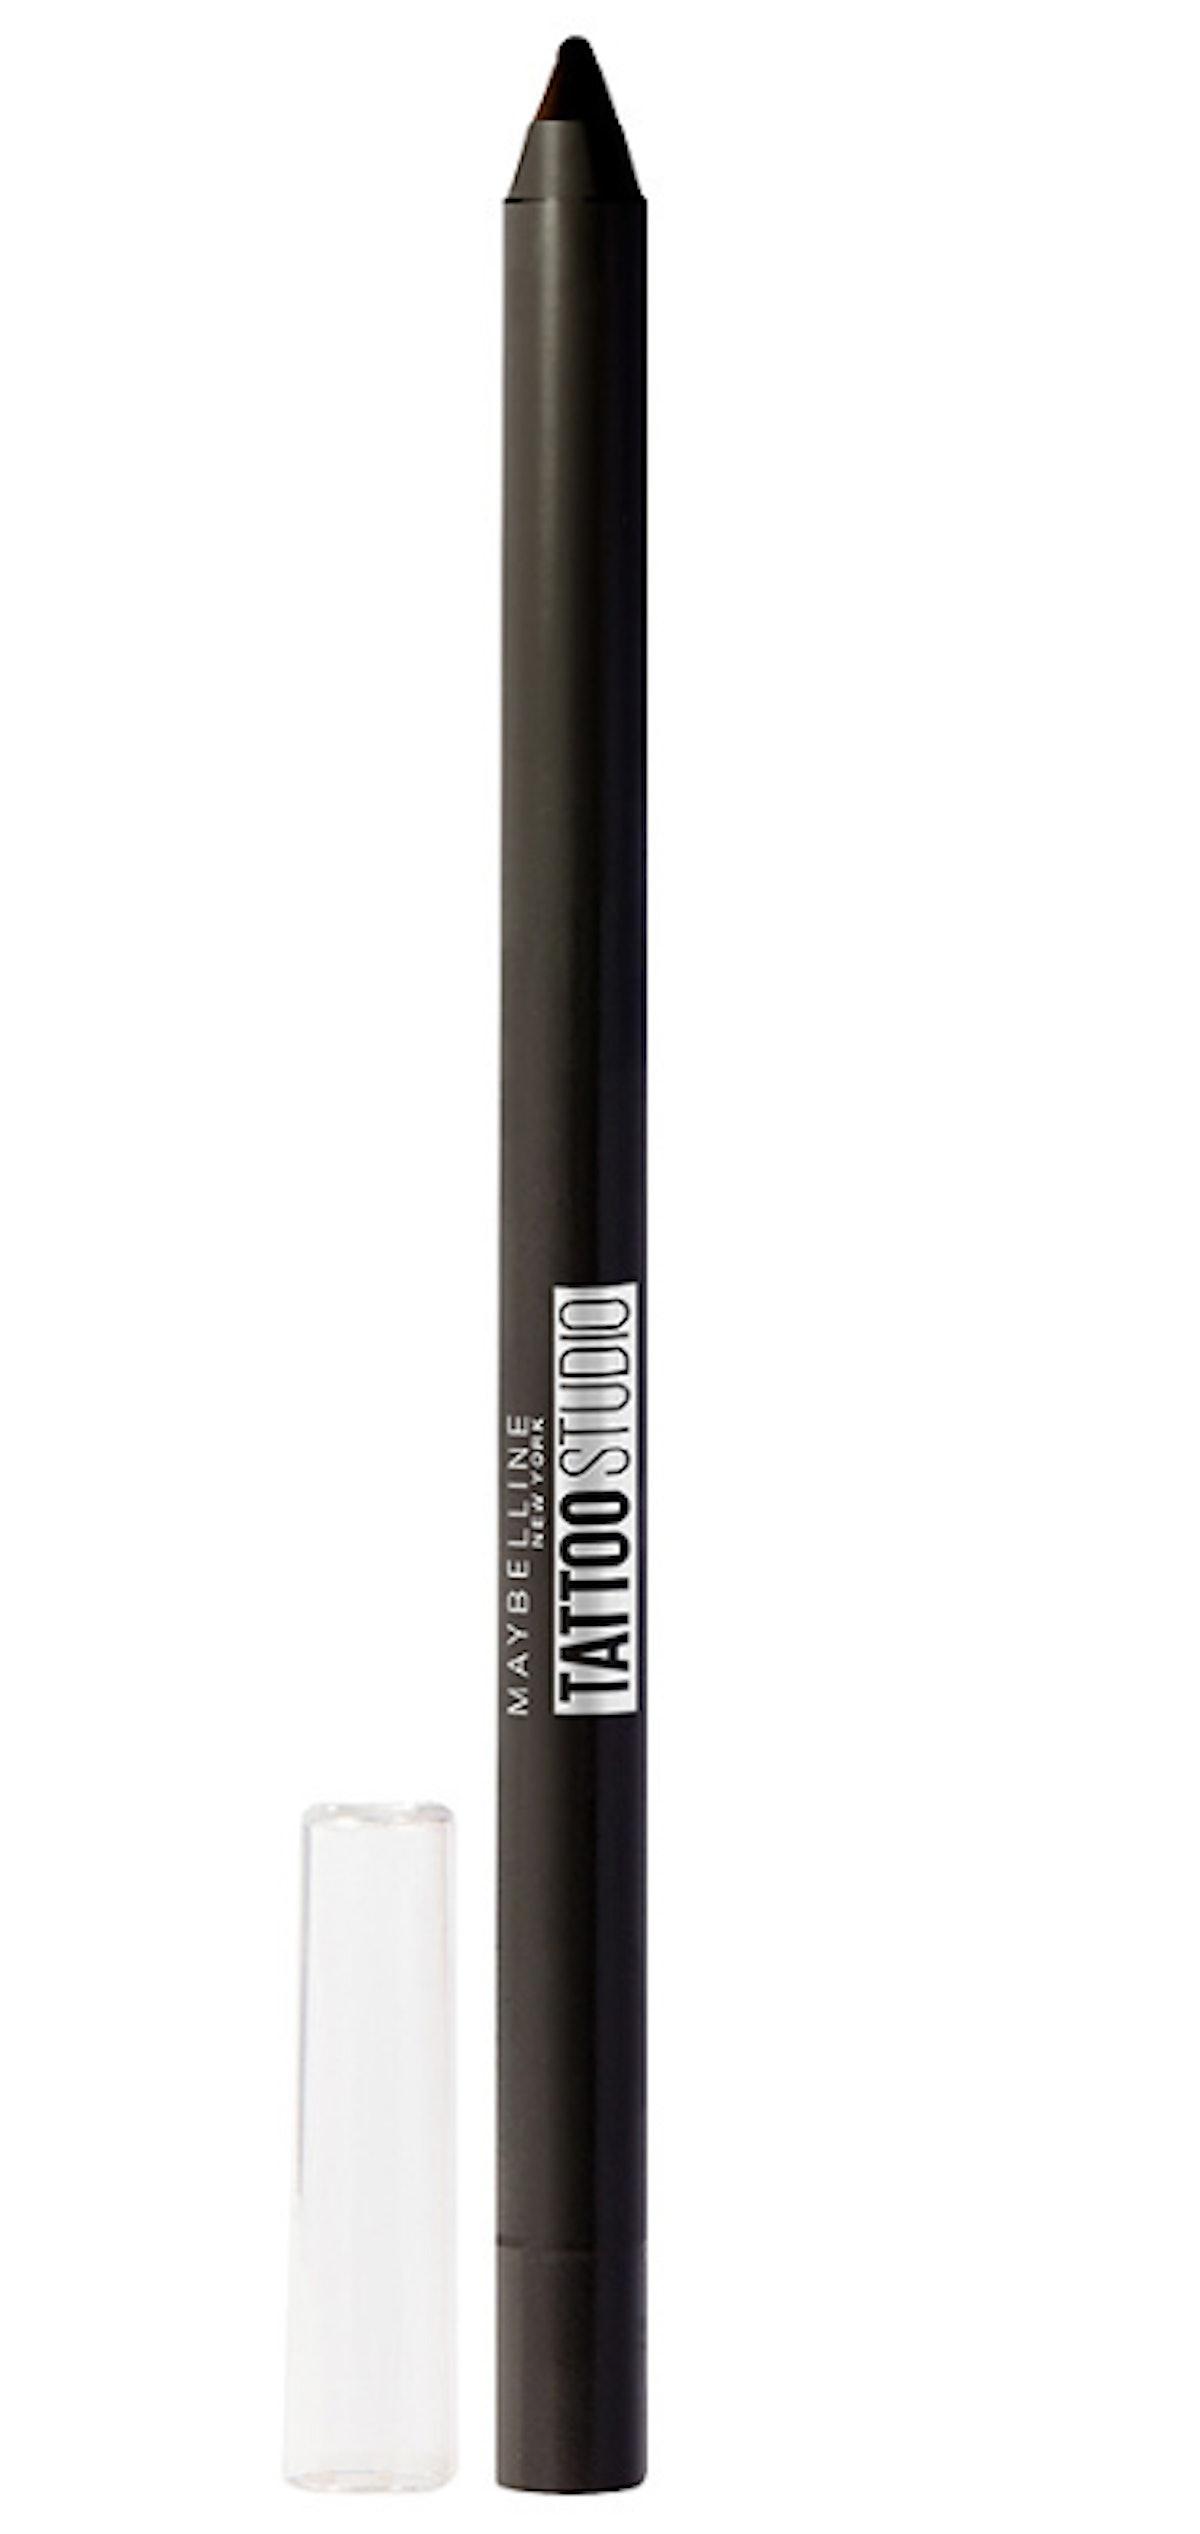 Maybelline's Tattoo Studio Pencil